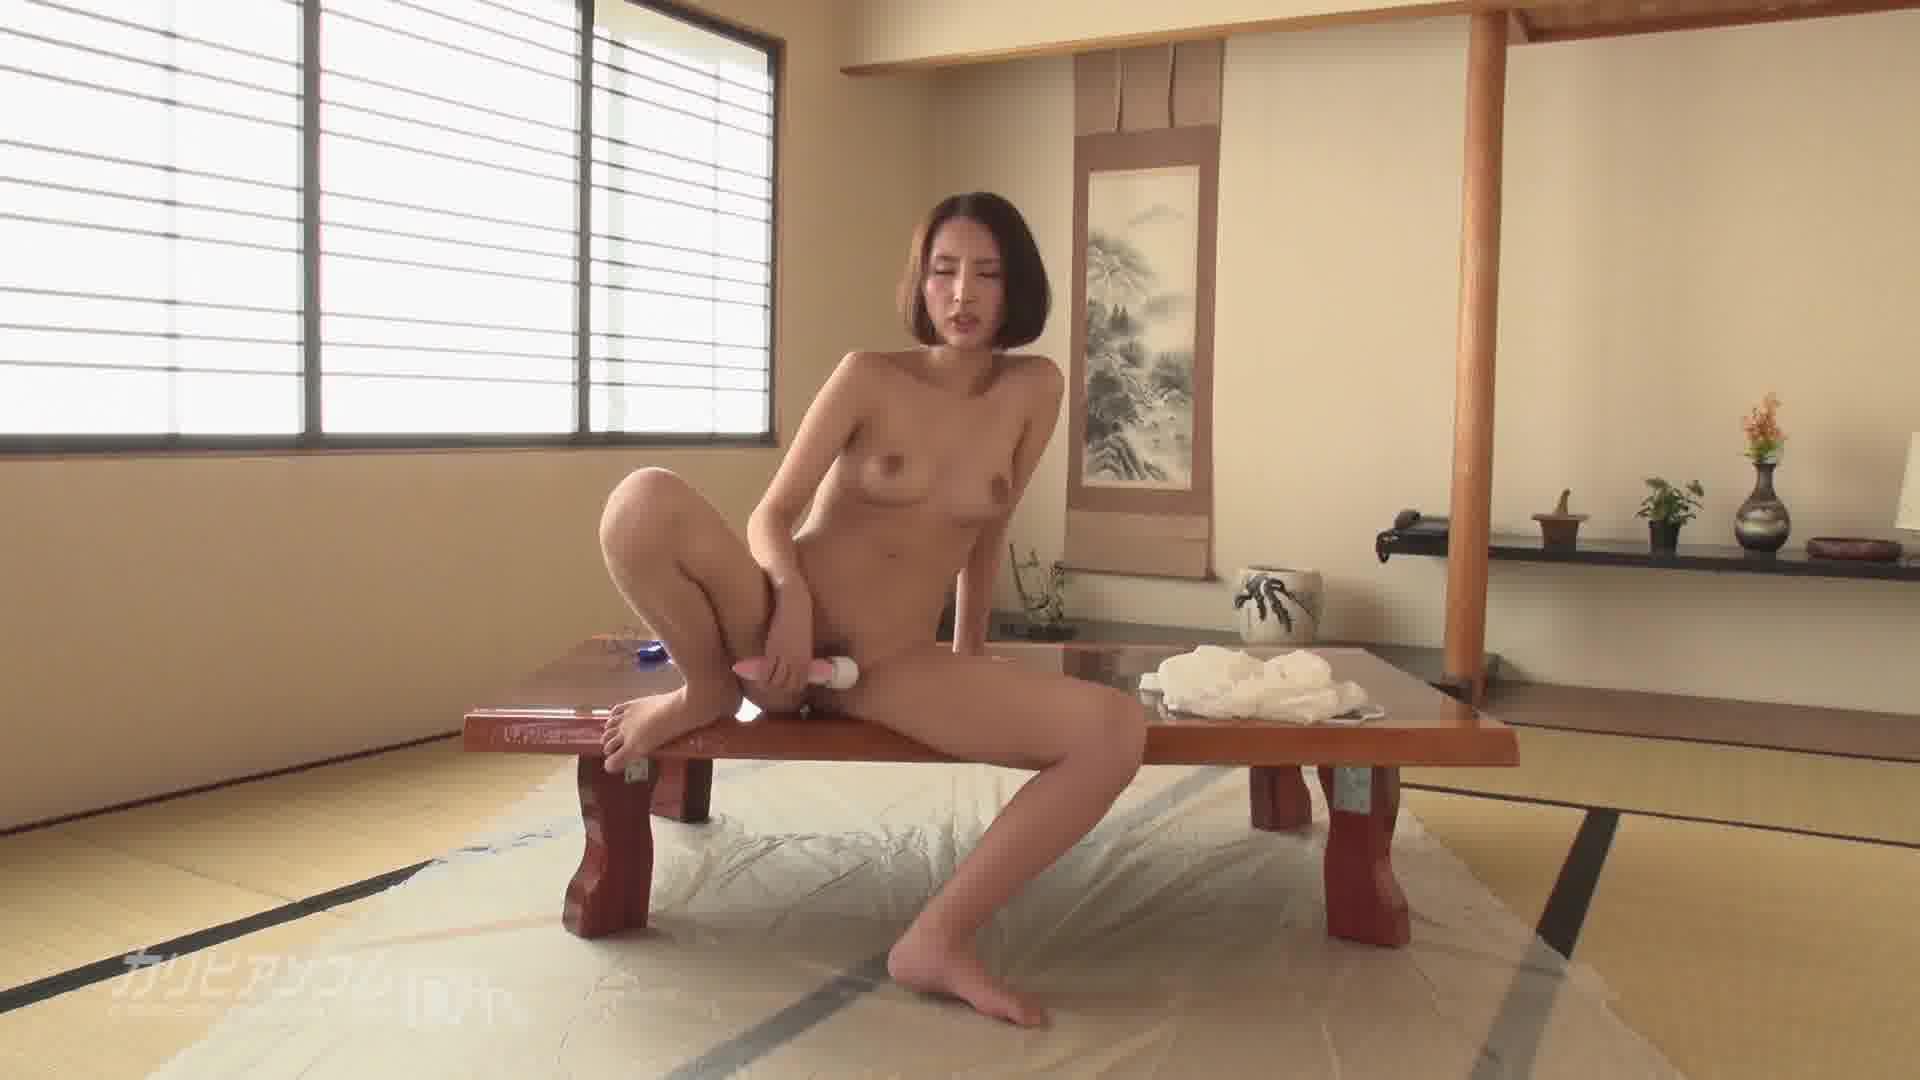 THE 未公開 ~おしっこ我慢大会~ - 七瀬リナ【バイブ・放尿・オナニー】